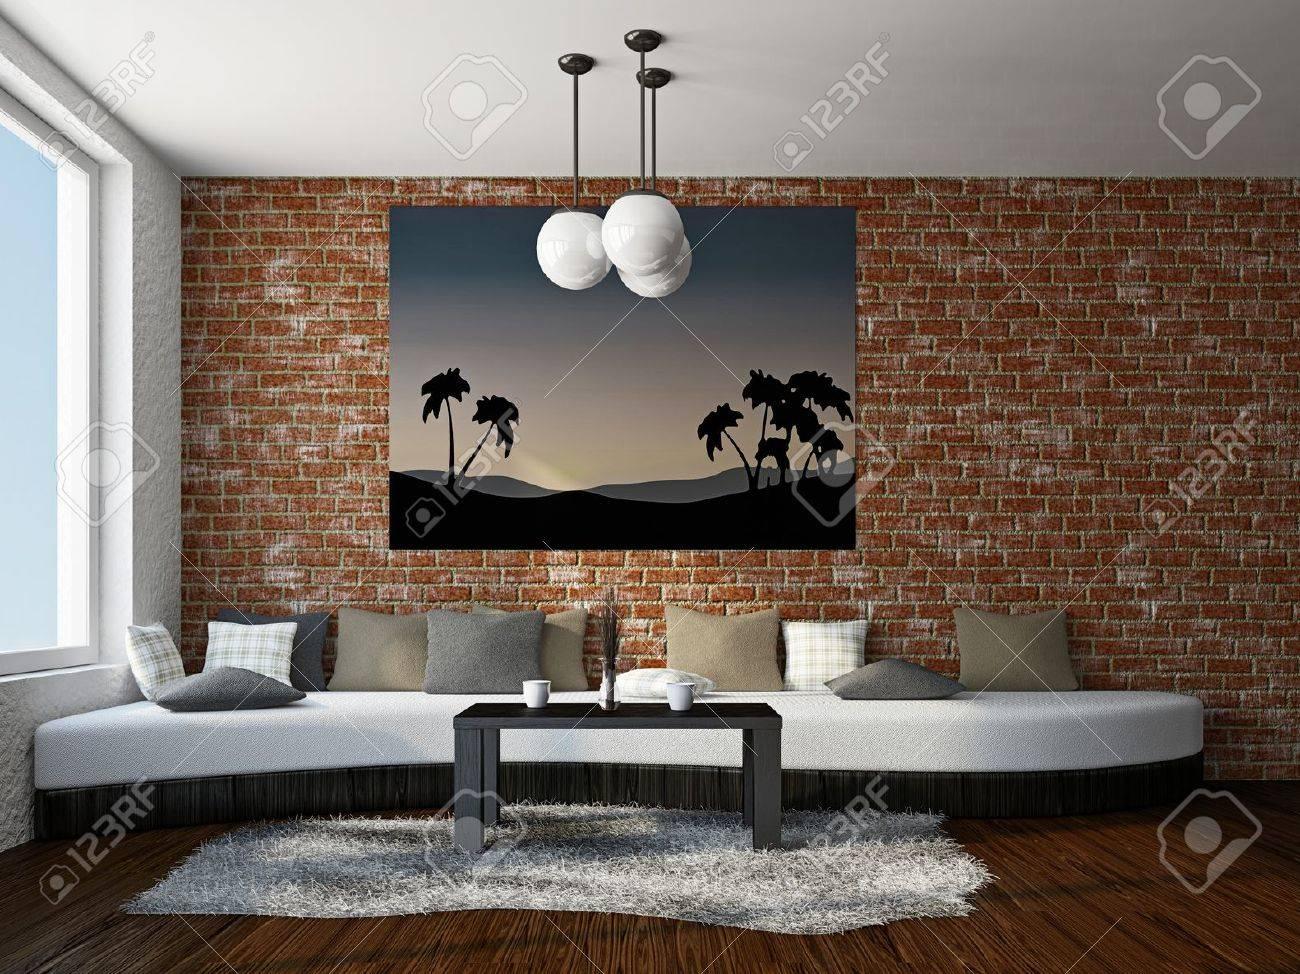 Livingroom With Big Sofa Near The Brick Wall Stock Photo   18902592 Part 55